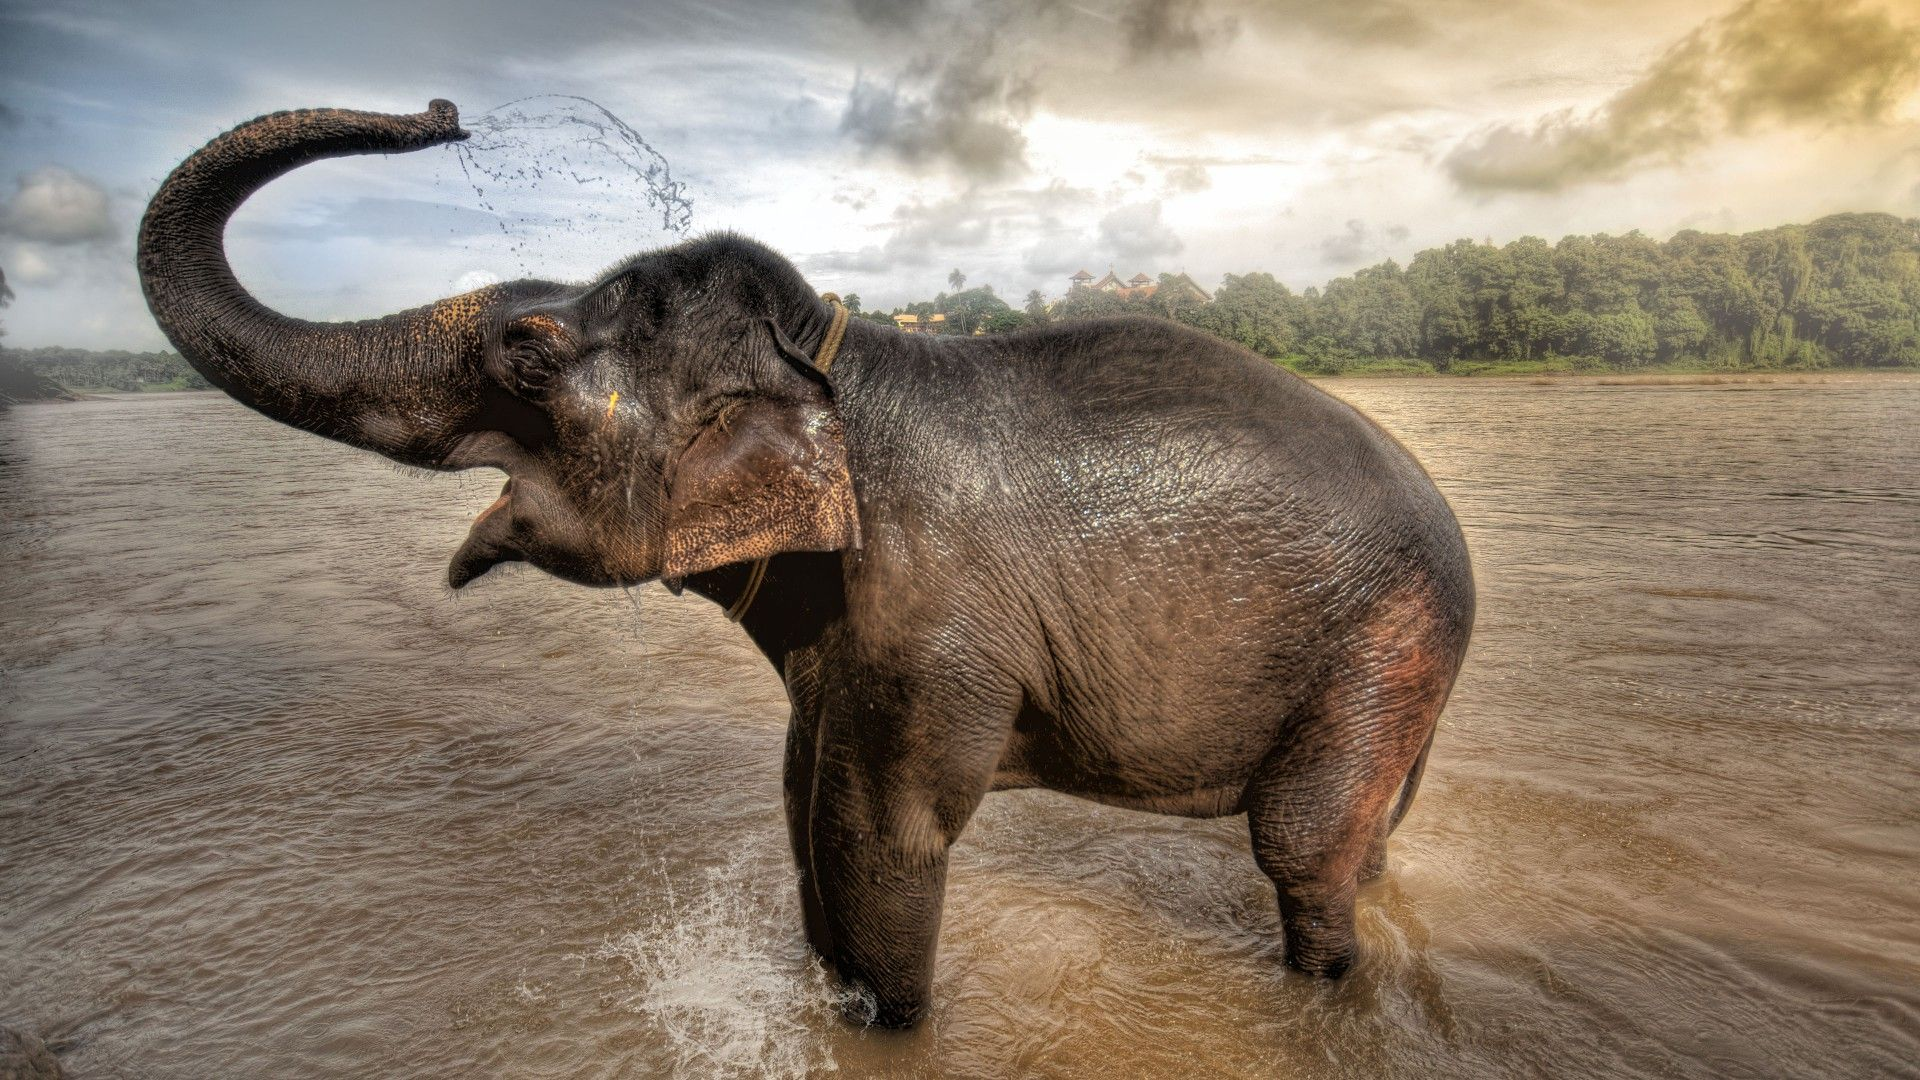 Elephant Wallpaper HD 1080pElephant Wallpaper HD 1080p